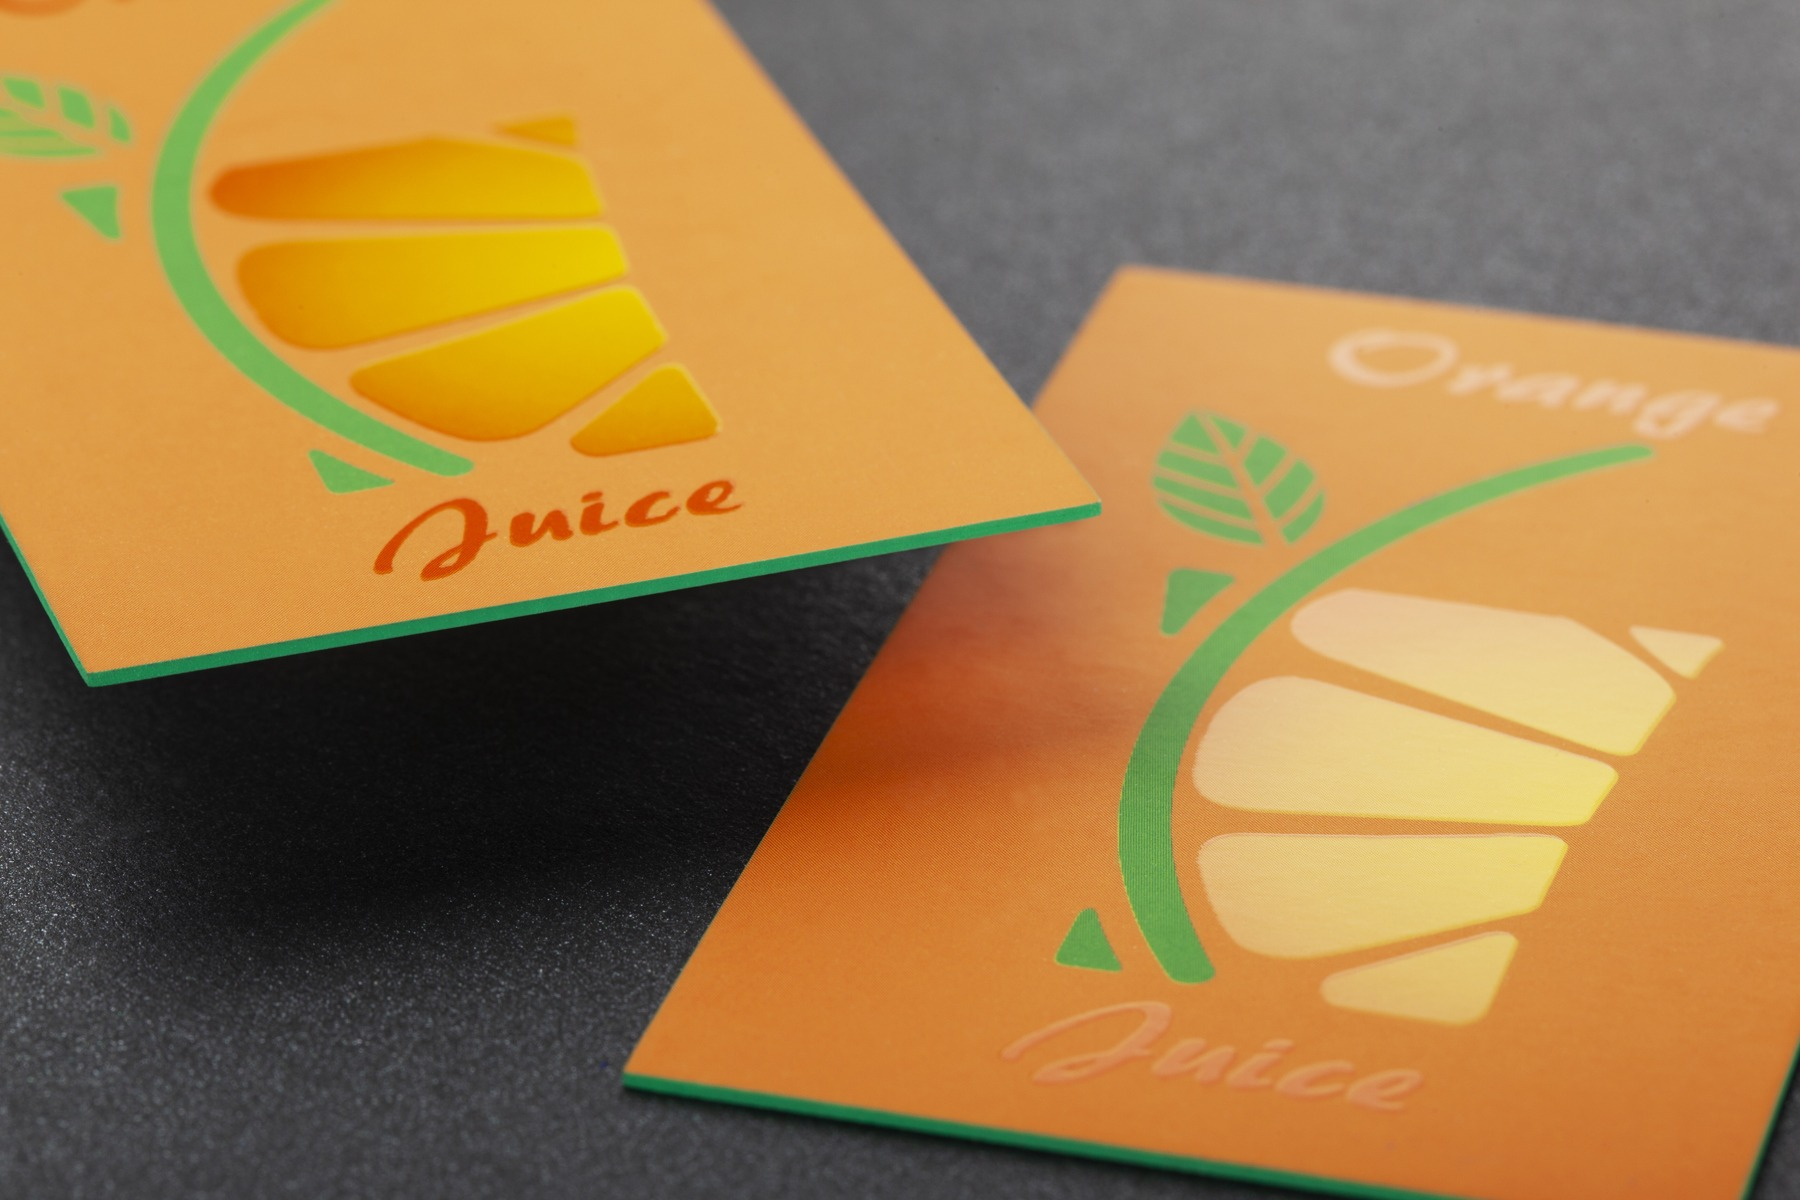 offset εκτύπωση κάρτας